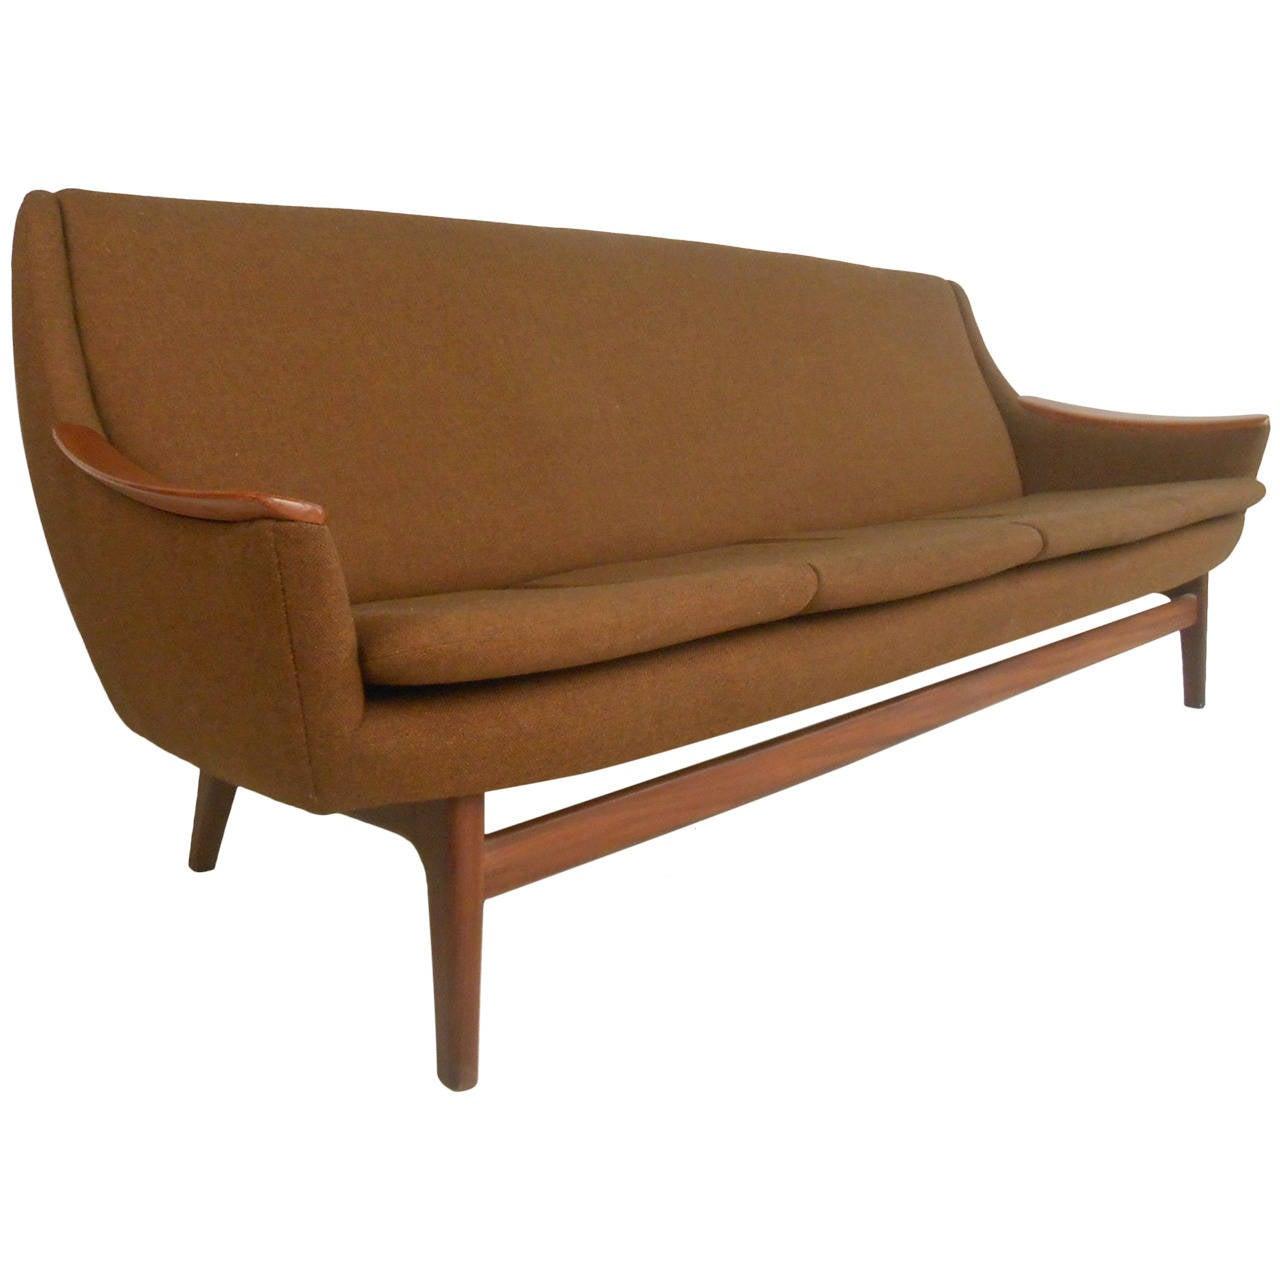 Sculptural Danish Modern Sofa At 1stdibs